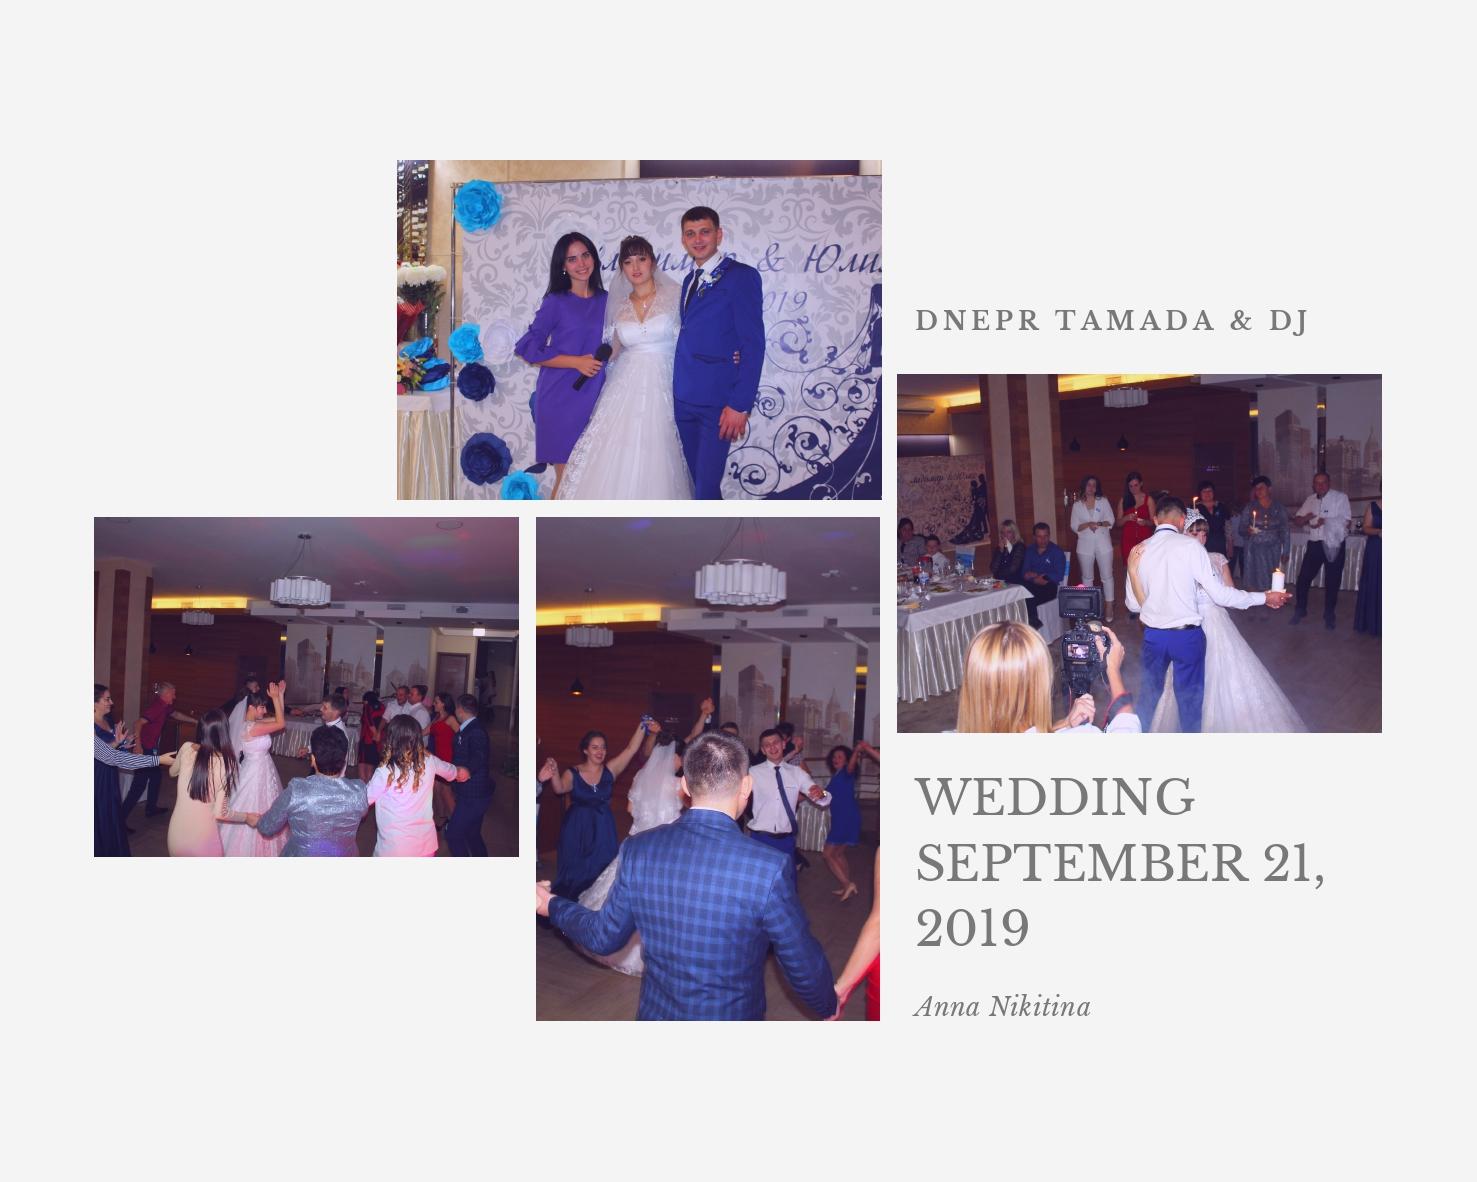 wedding September 21, 2019_page-0001